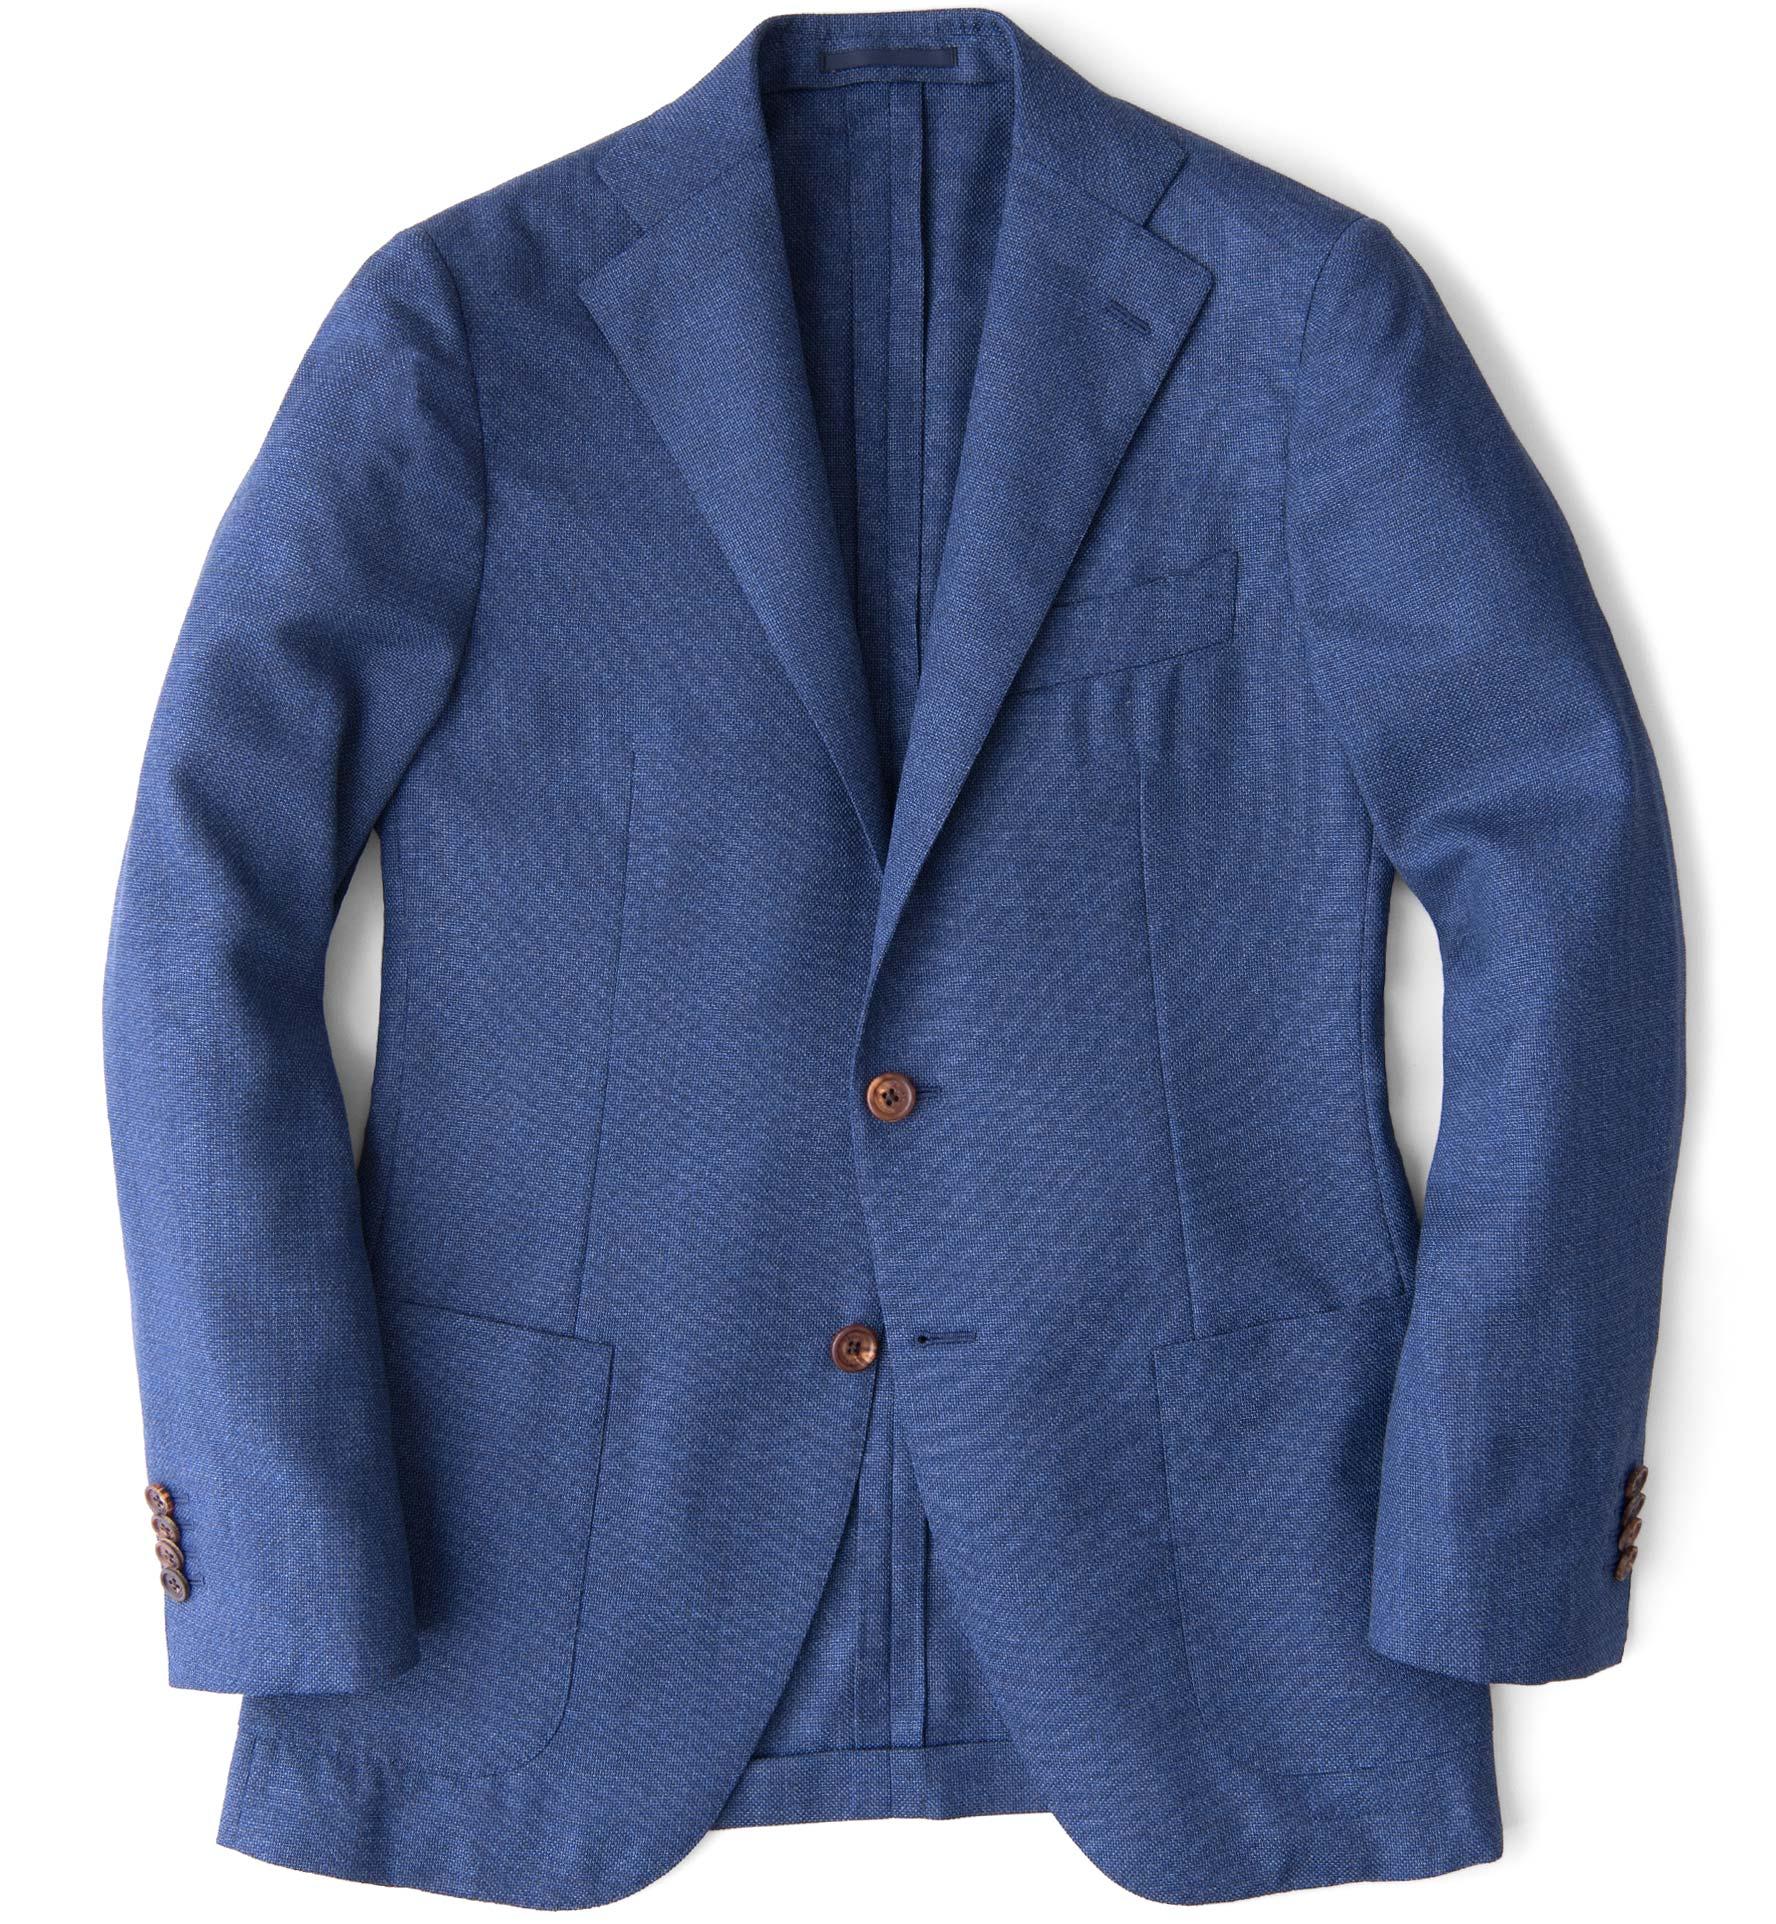 Zoom Image of Hudson Ocean Blue Melange Wool Hopsack Jacket